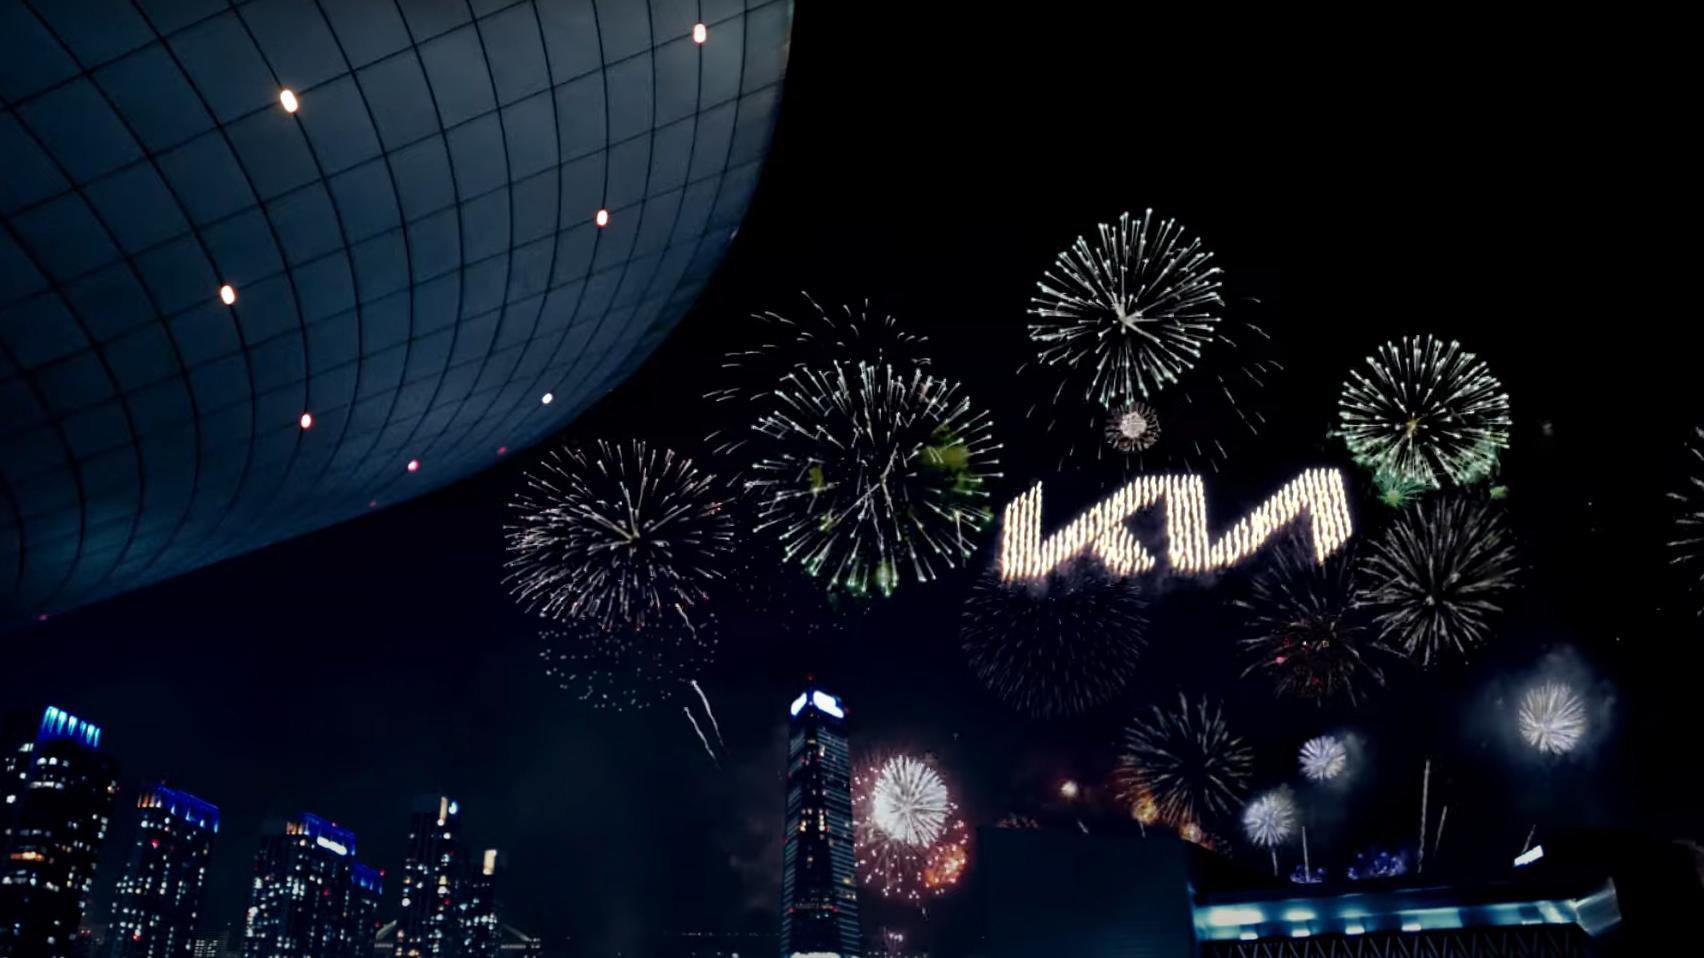 Новое лого Kia представили танцующие пиродроны: видео